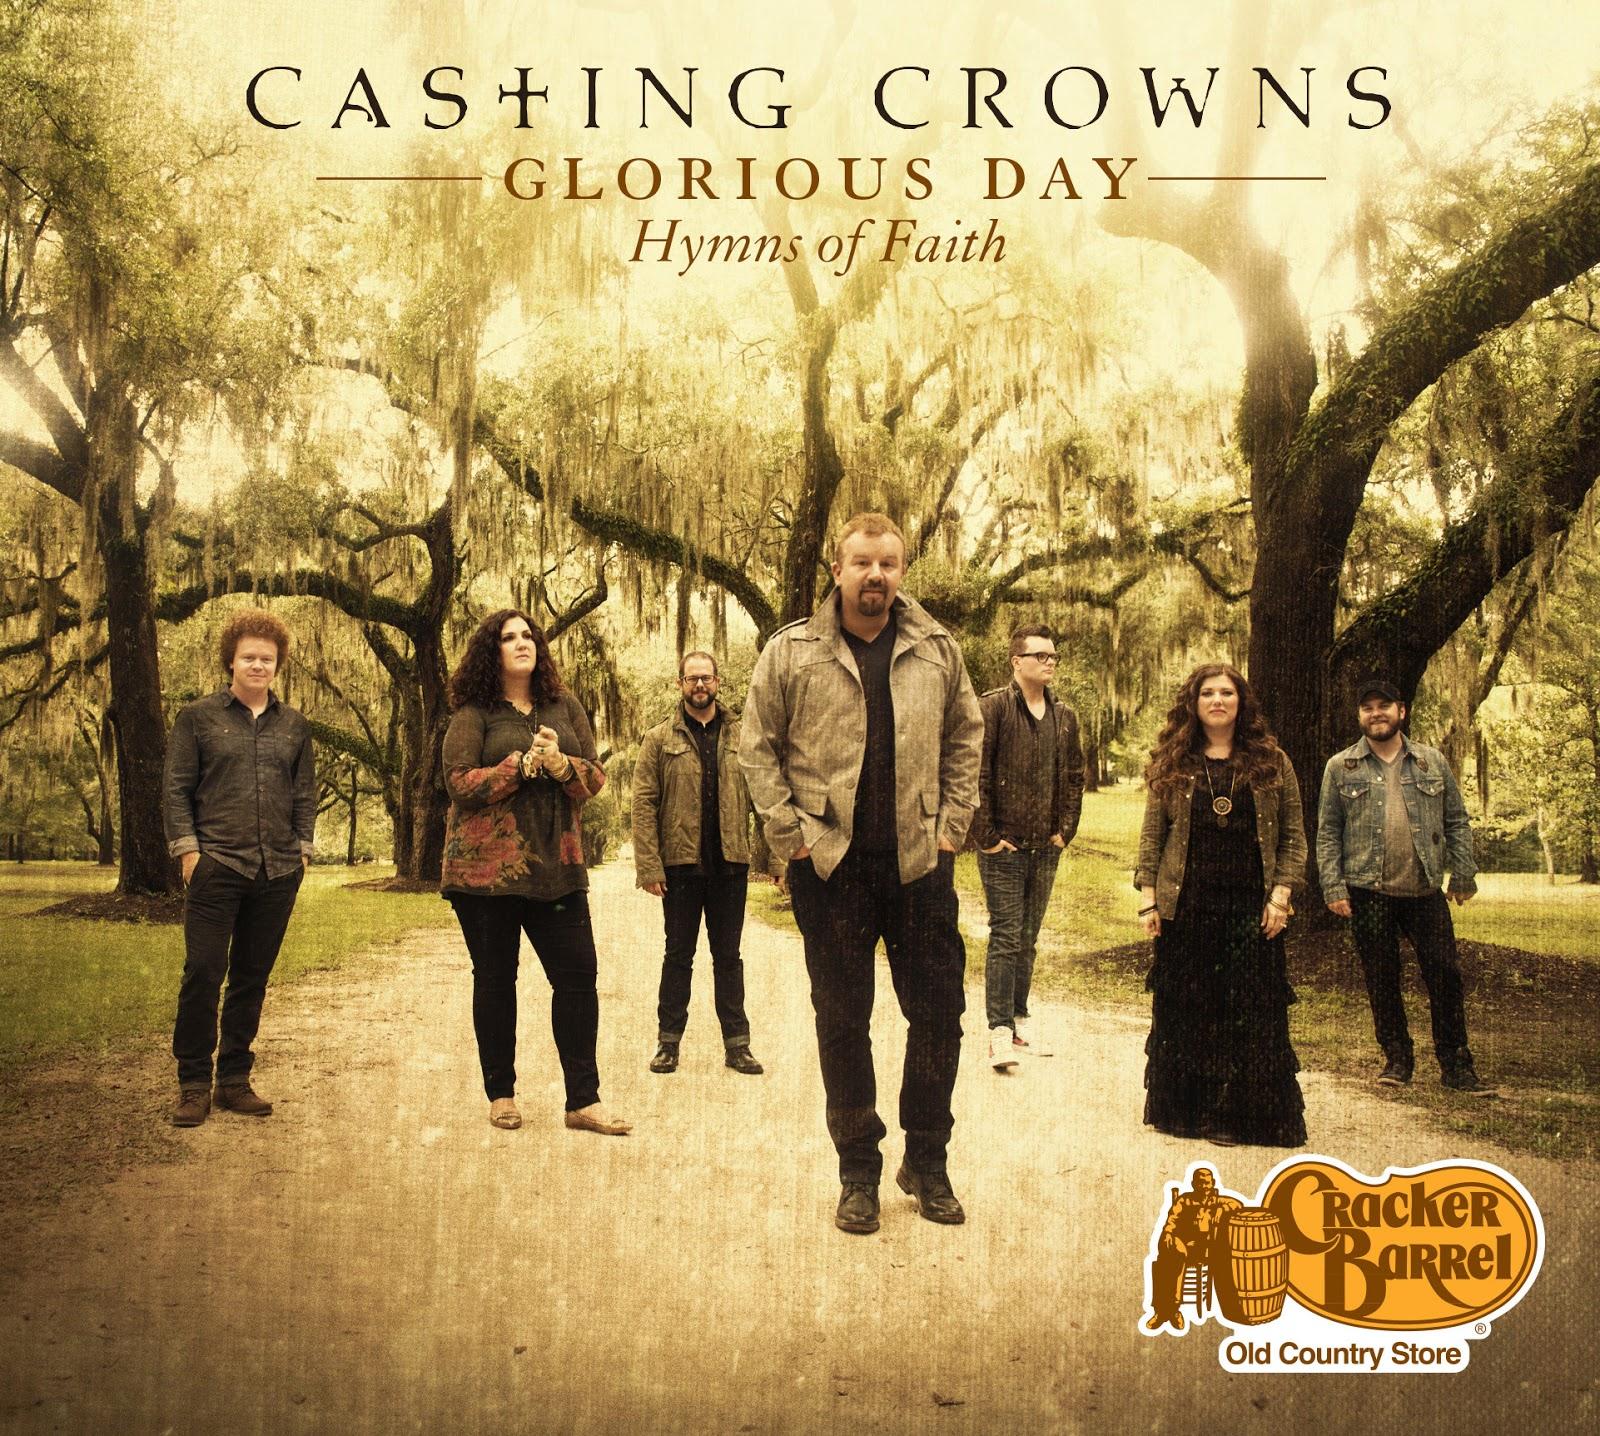 casting crowns 2003 album download